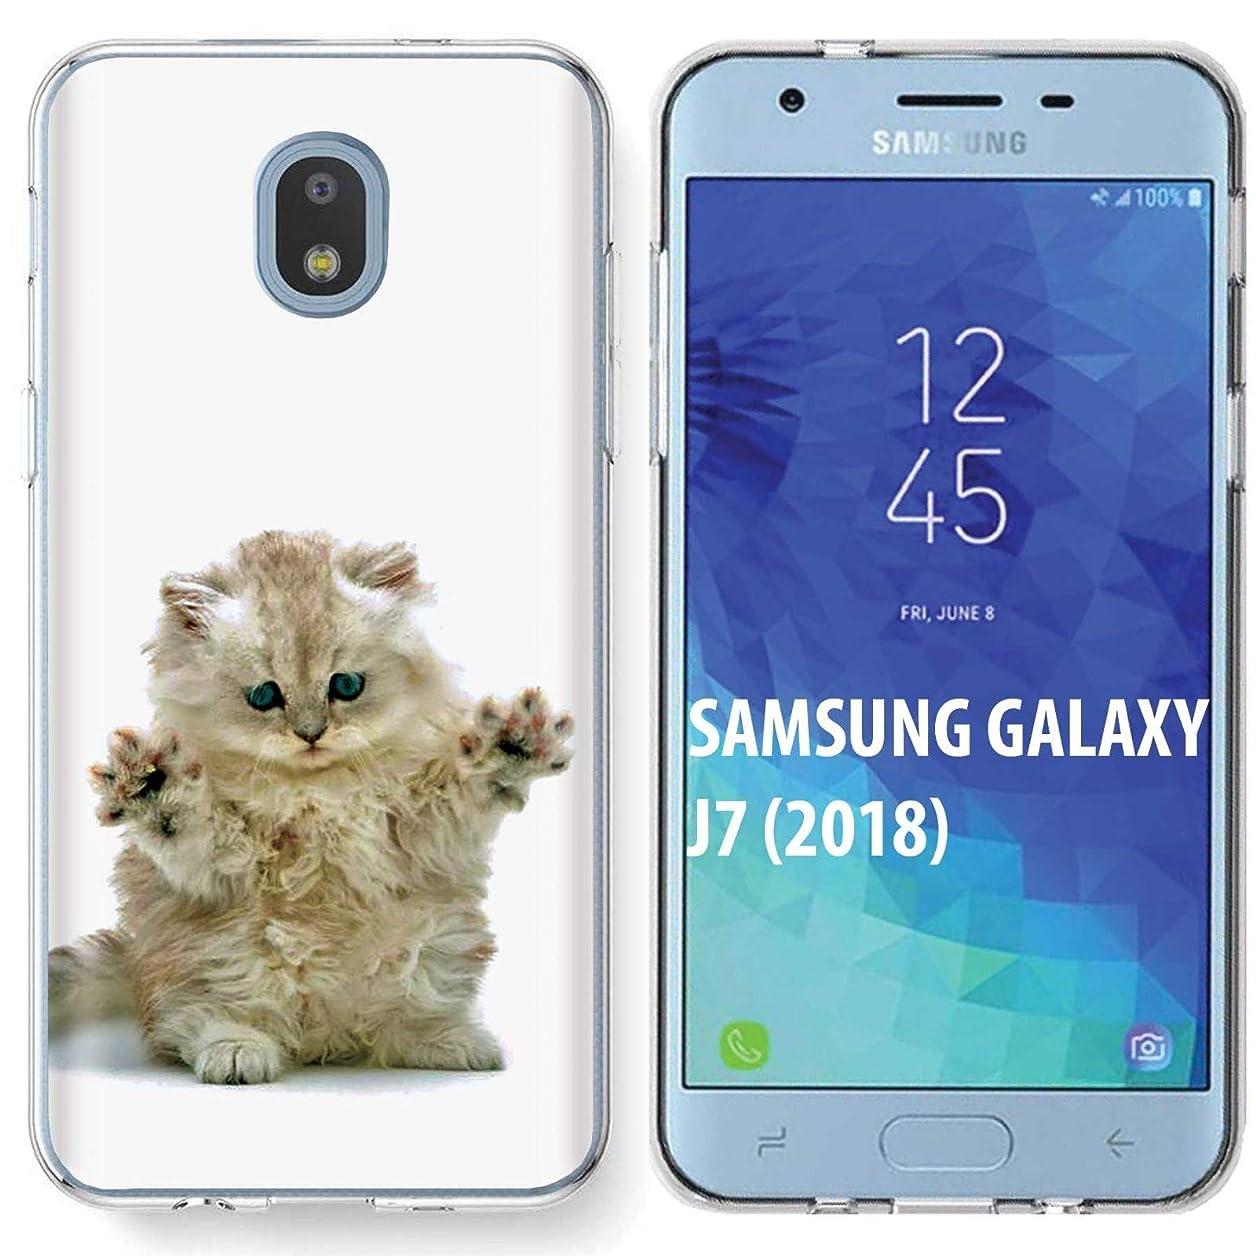 [NakedShield] Samsung Galaxy (J7 2018)/J7 Aero/J7 Refine/J7 Star/J737/J7 V 2nd Gen [Clear] Ultra Slim TPU Phone Cover Case [Funny Cat Print] pqhqkdxbohqqaydp